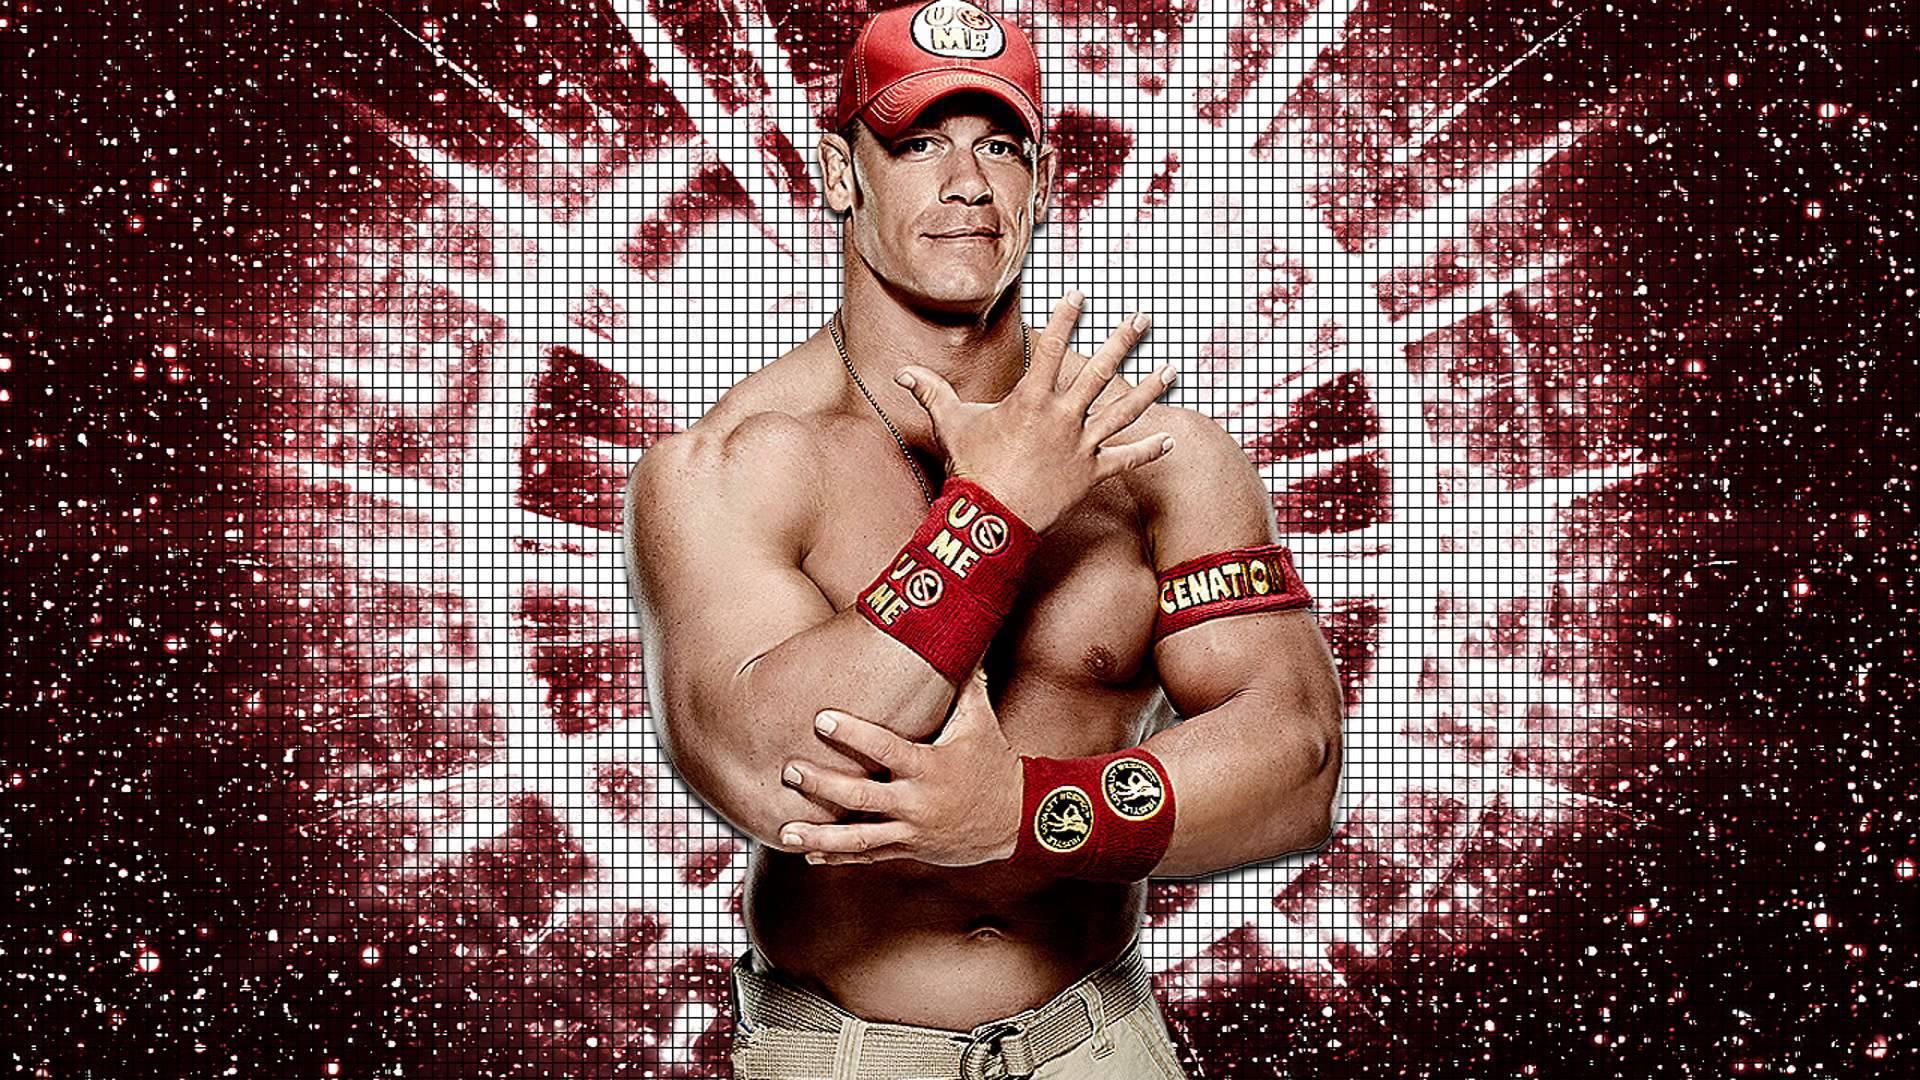 Best Images Of John Cena